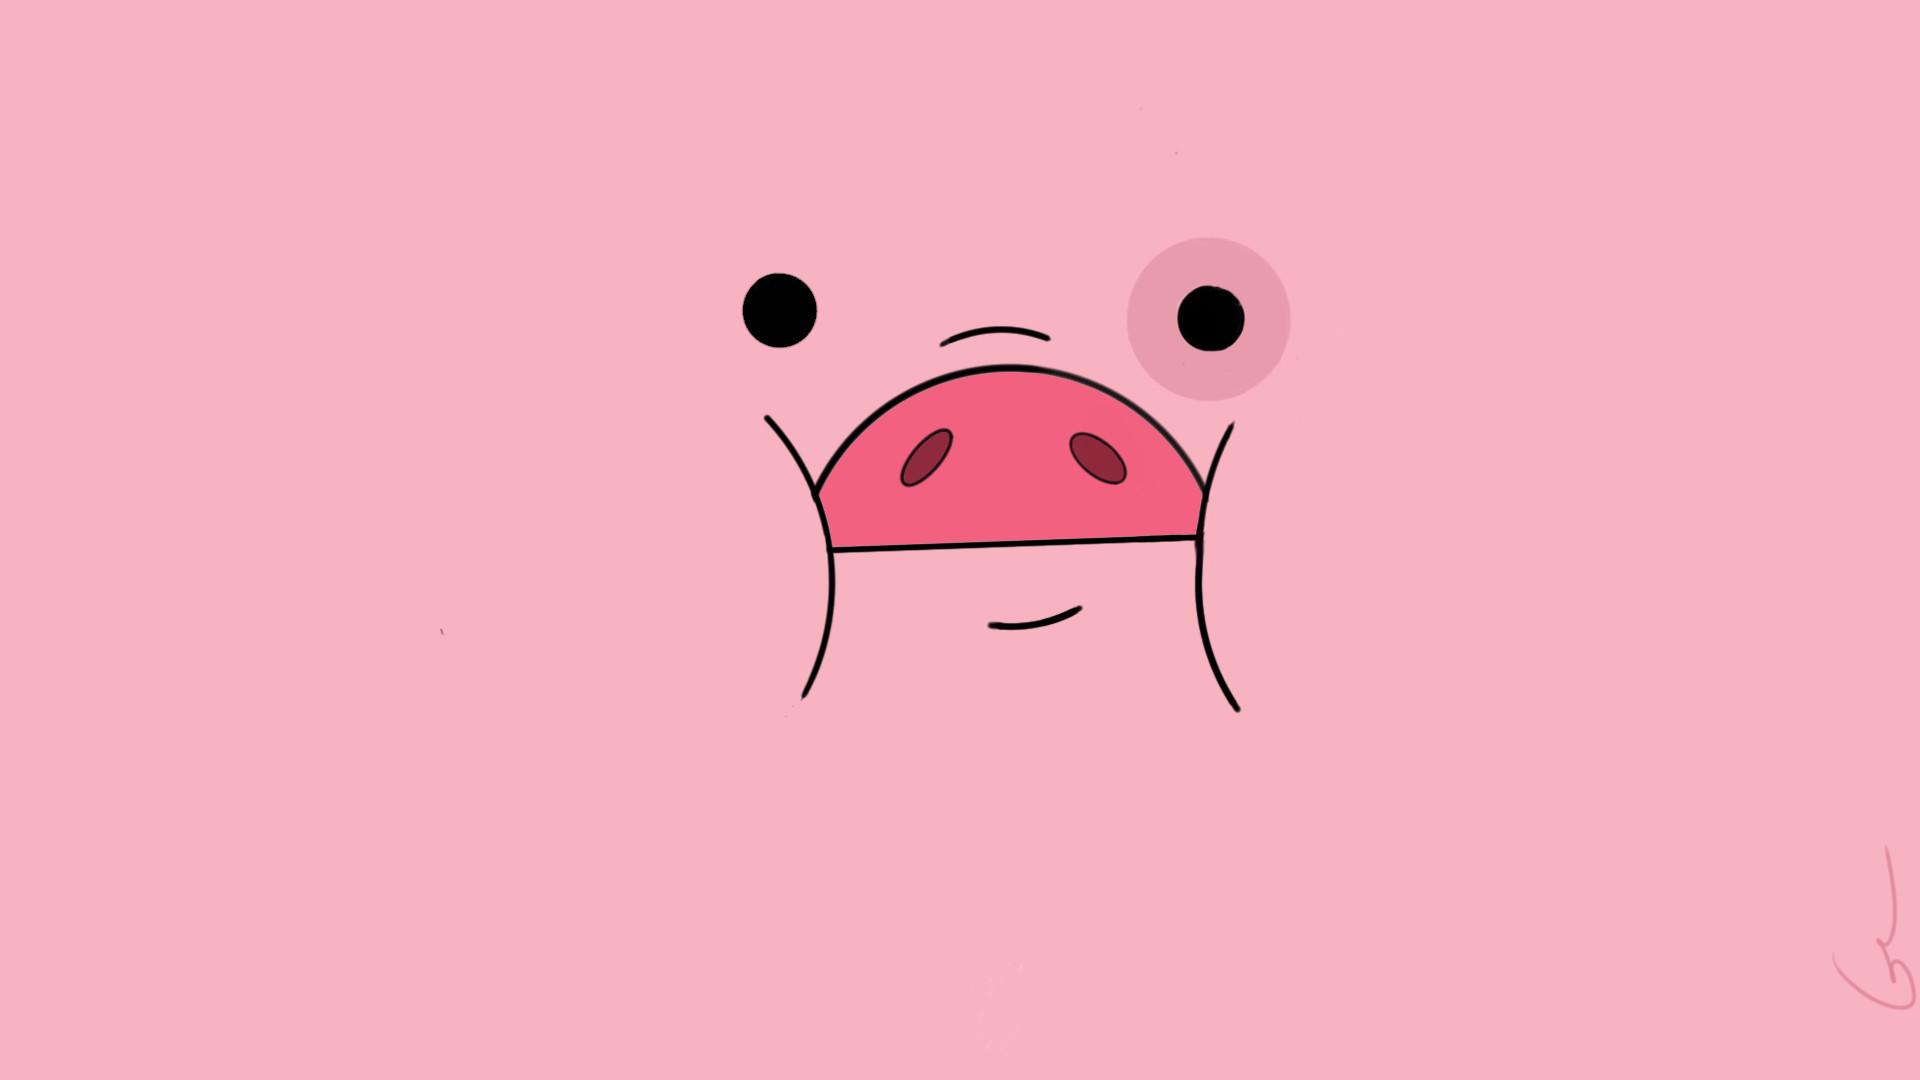 Pig Wallpaper (62+ Images